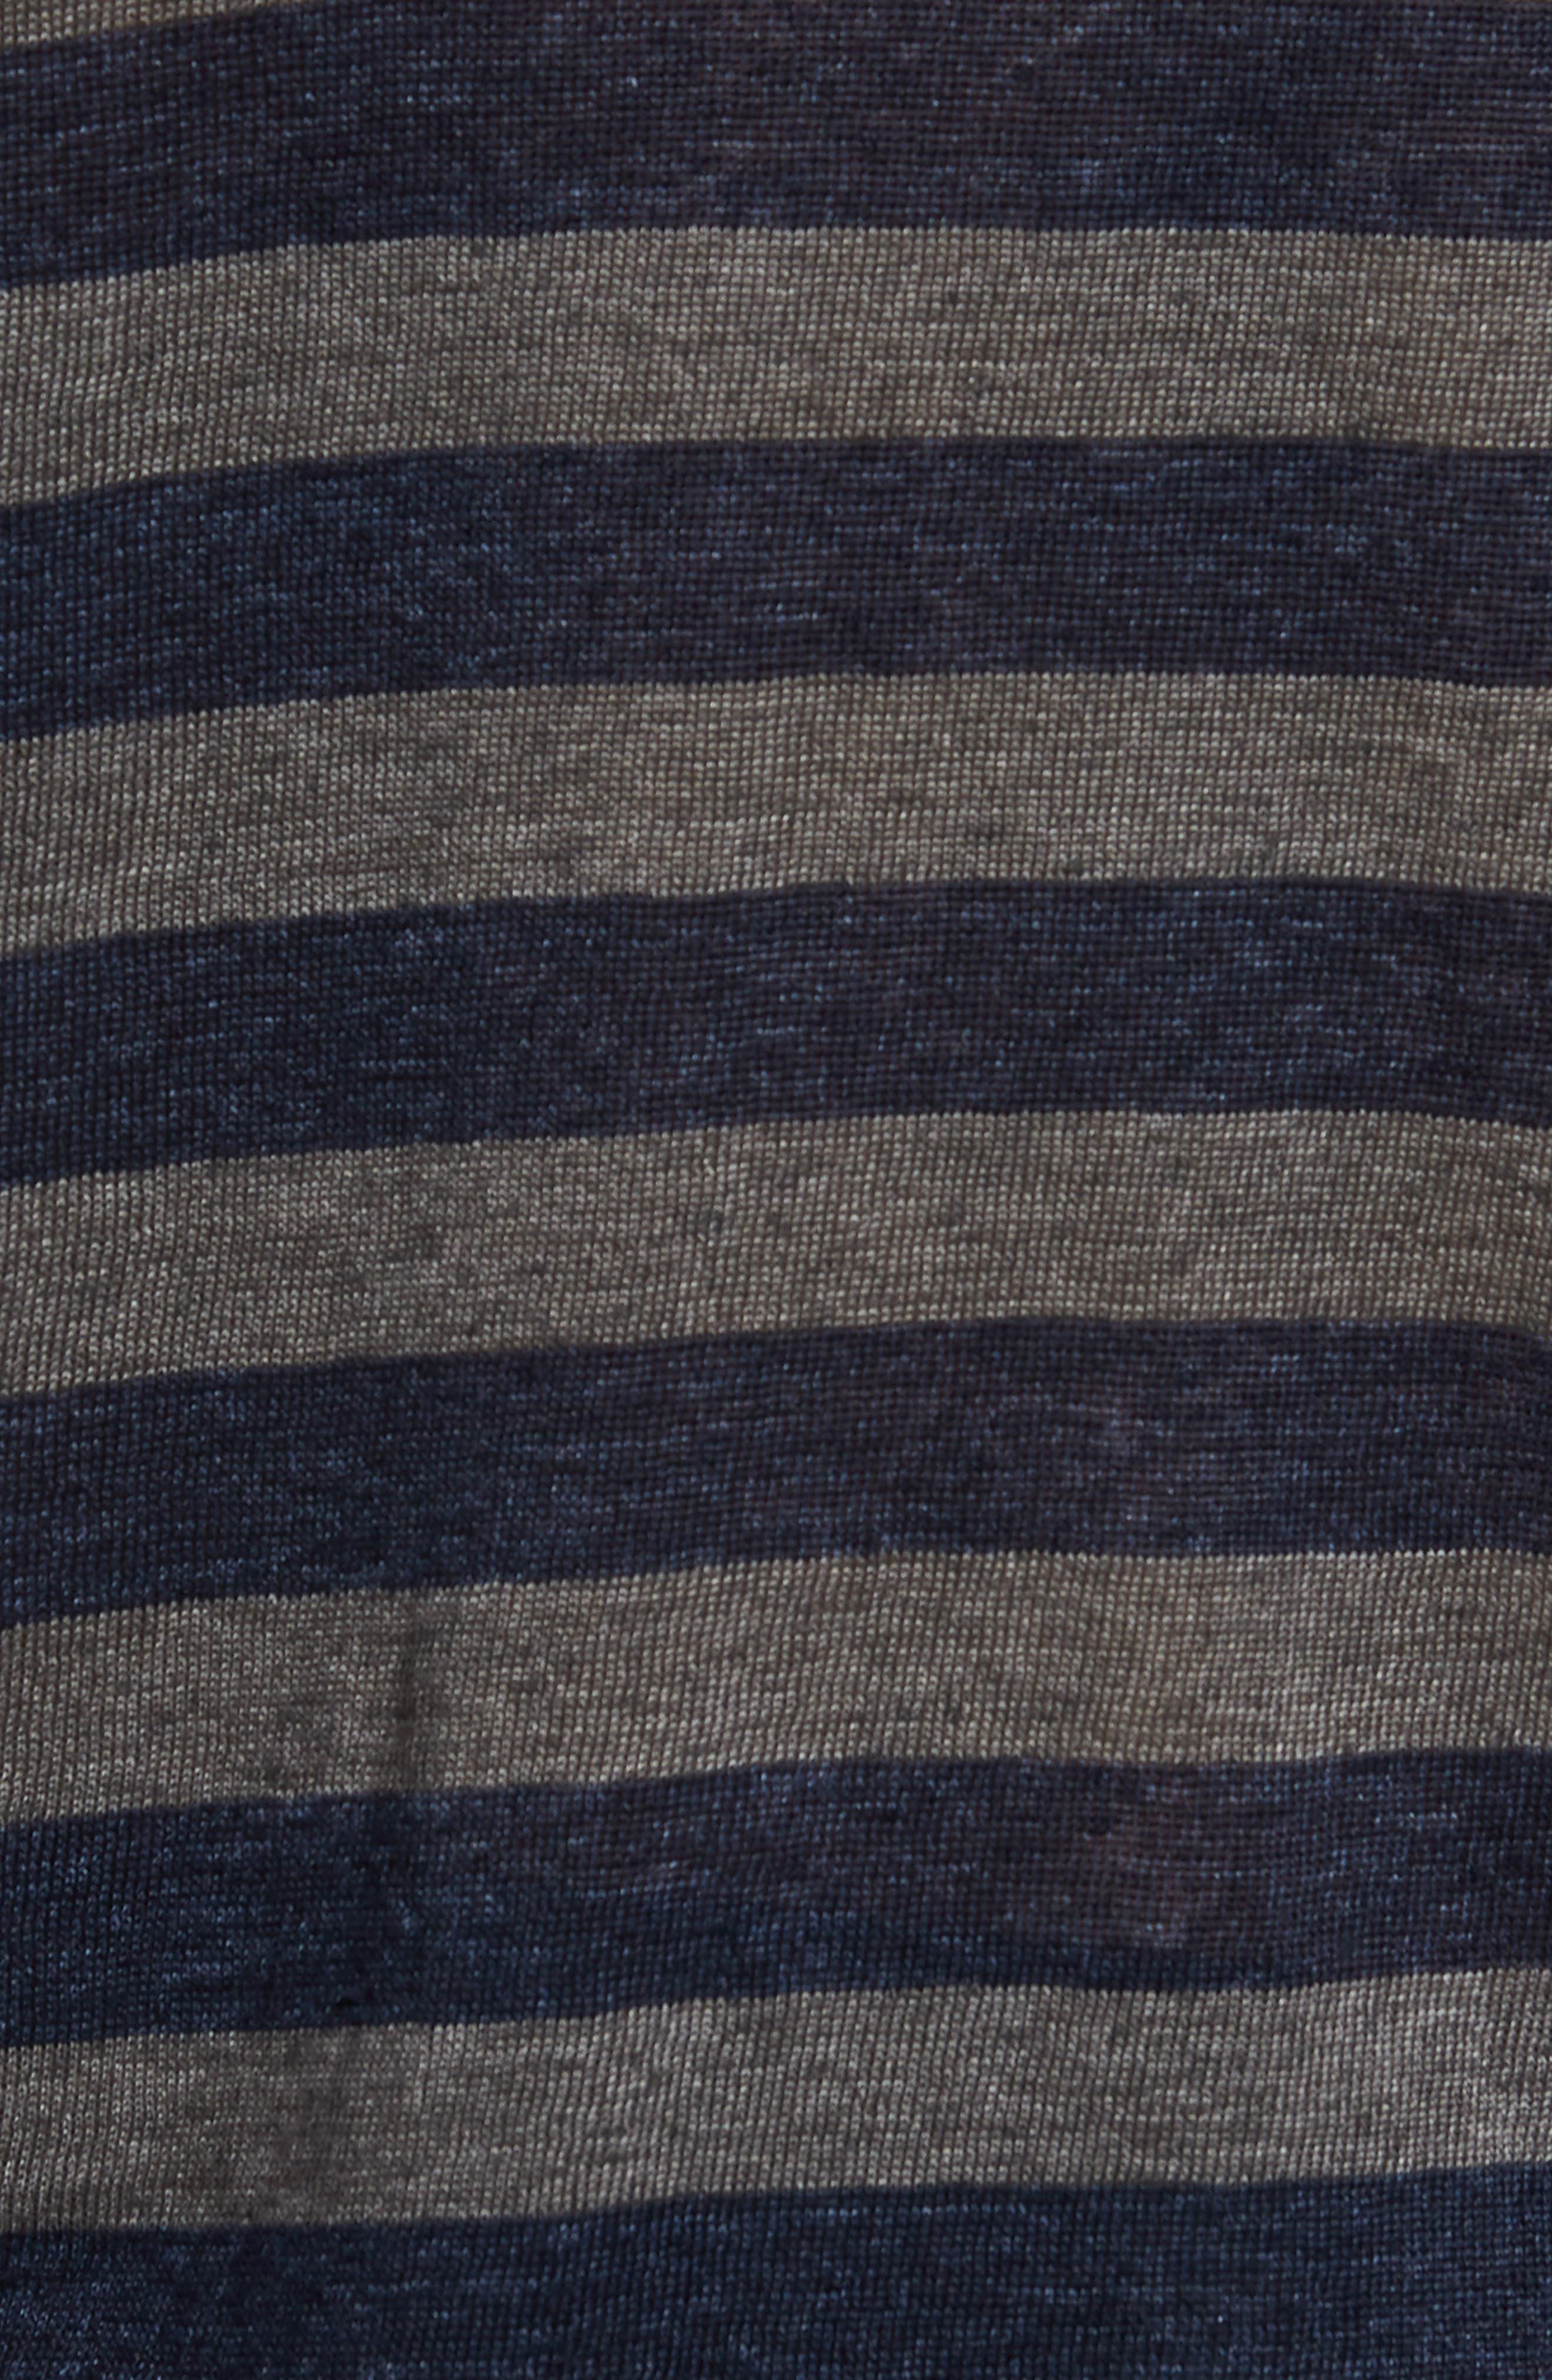 & Bros. Stripe Linen Sweater,                             Alternate thumbnail 5, color,                             Navy Stripe